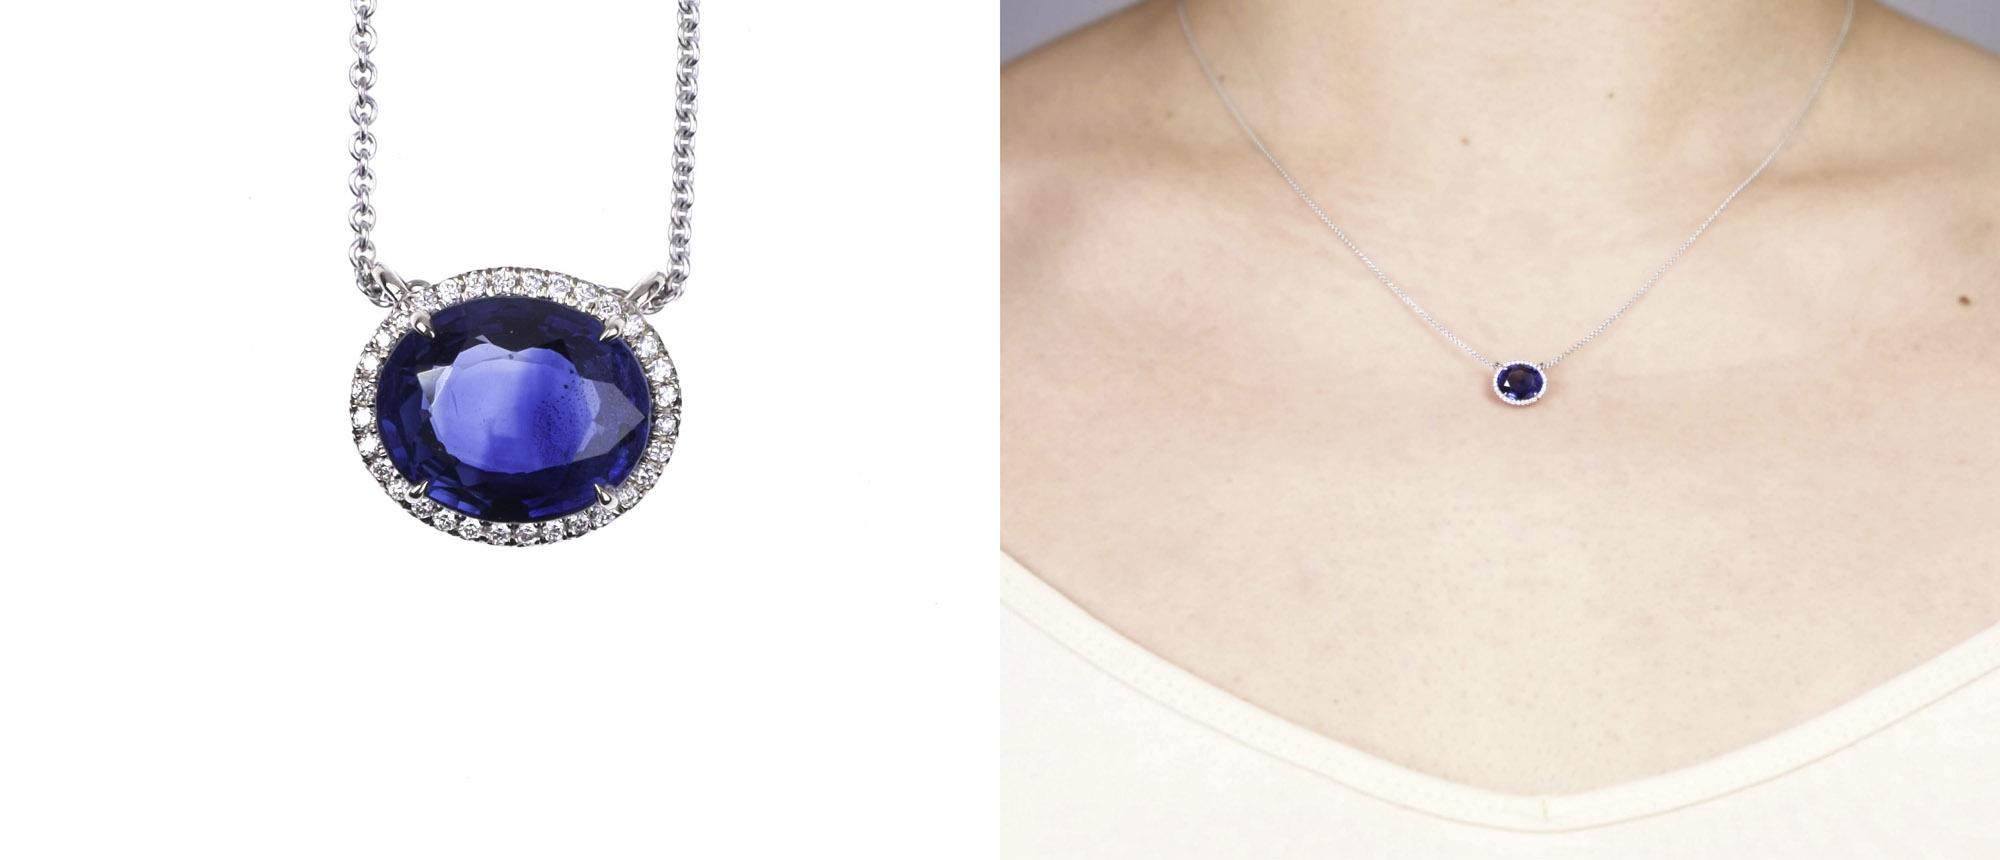 BLue Sapphire pendant2pic.jpg